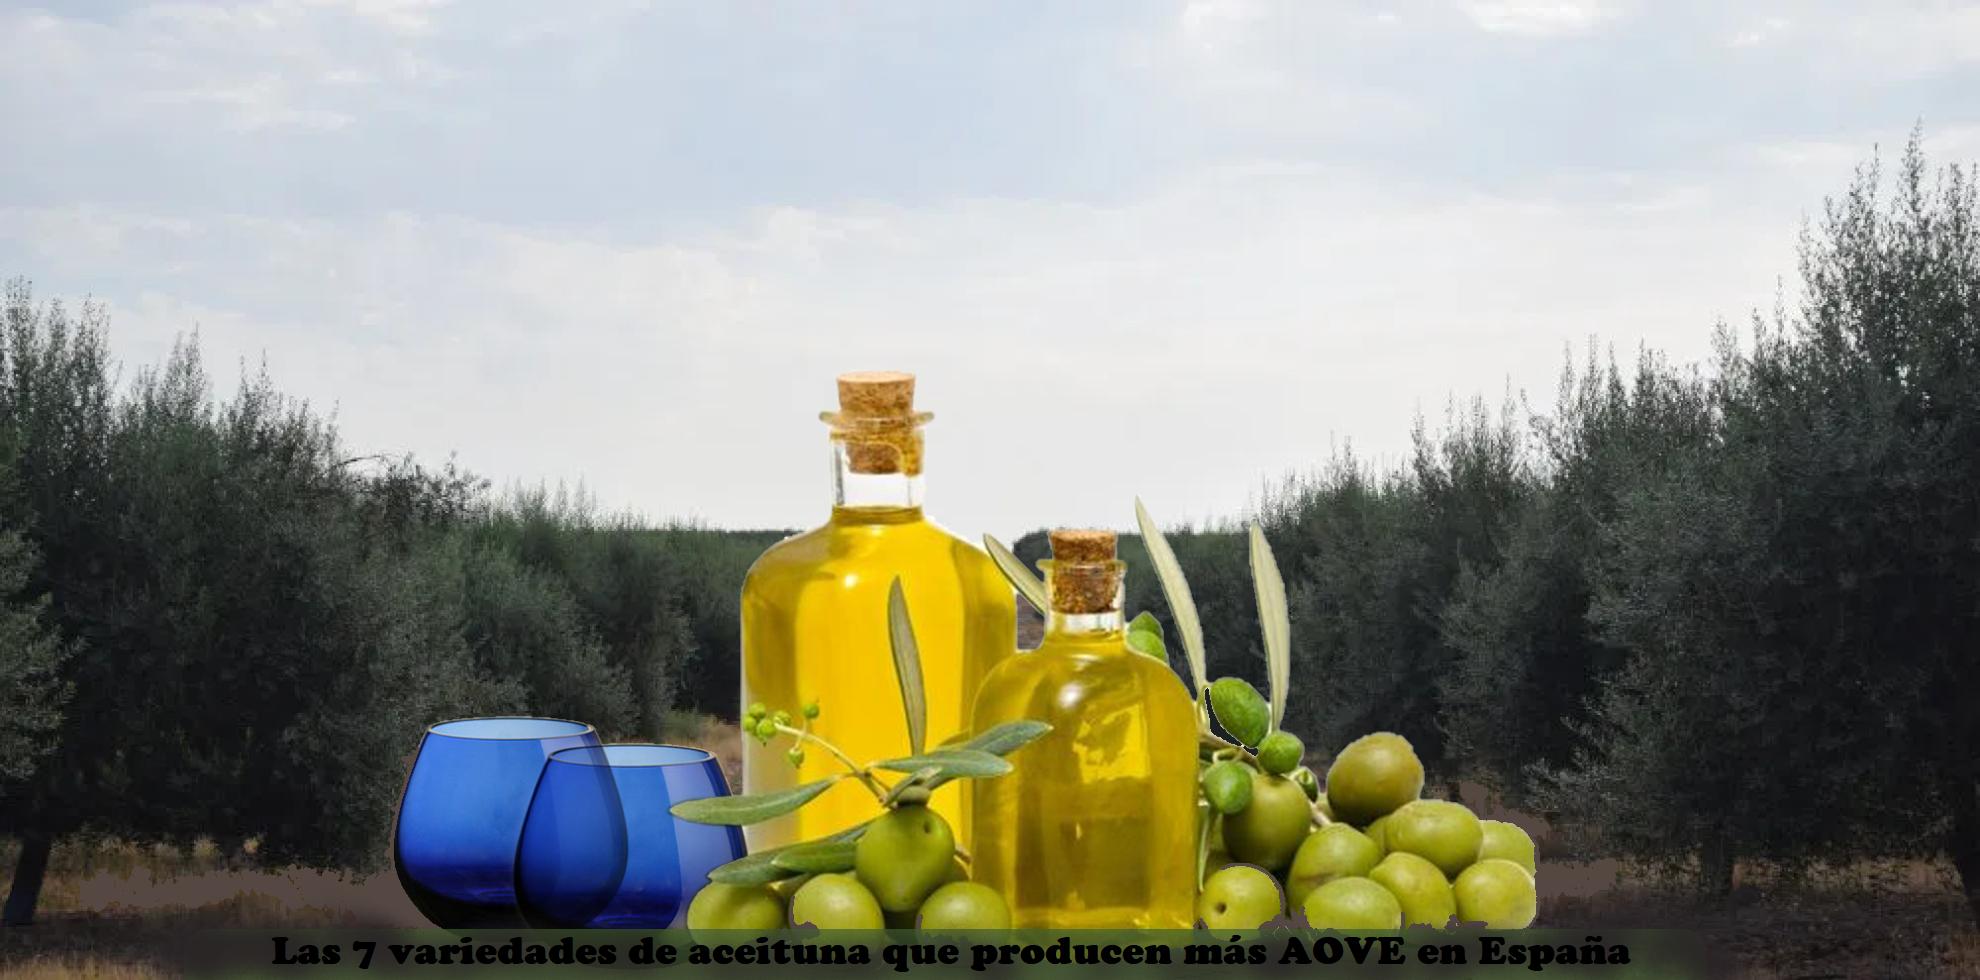 7 variedades de aceituna